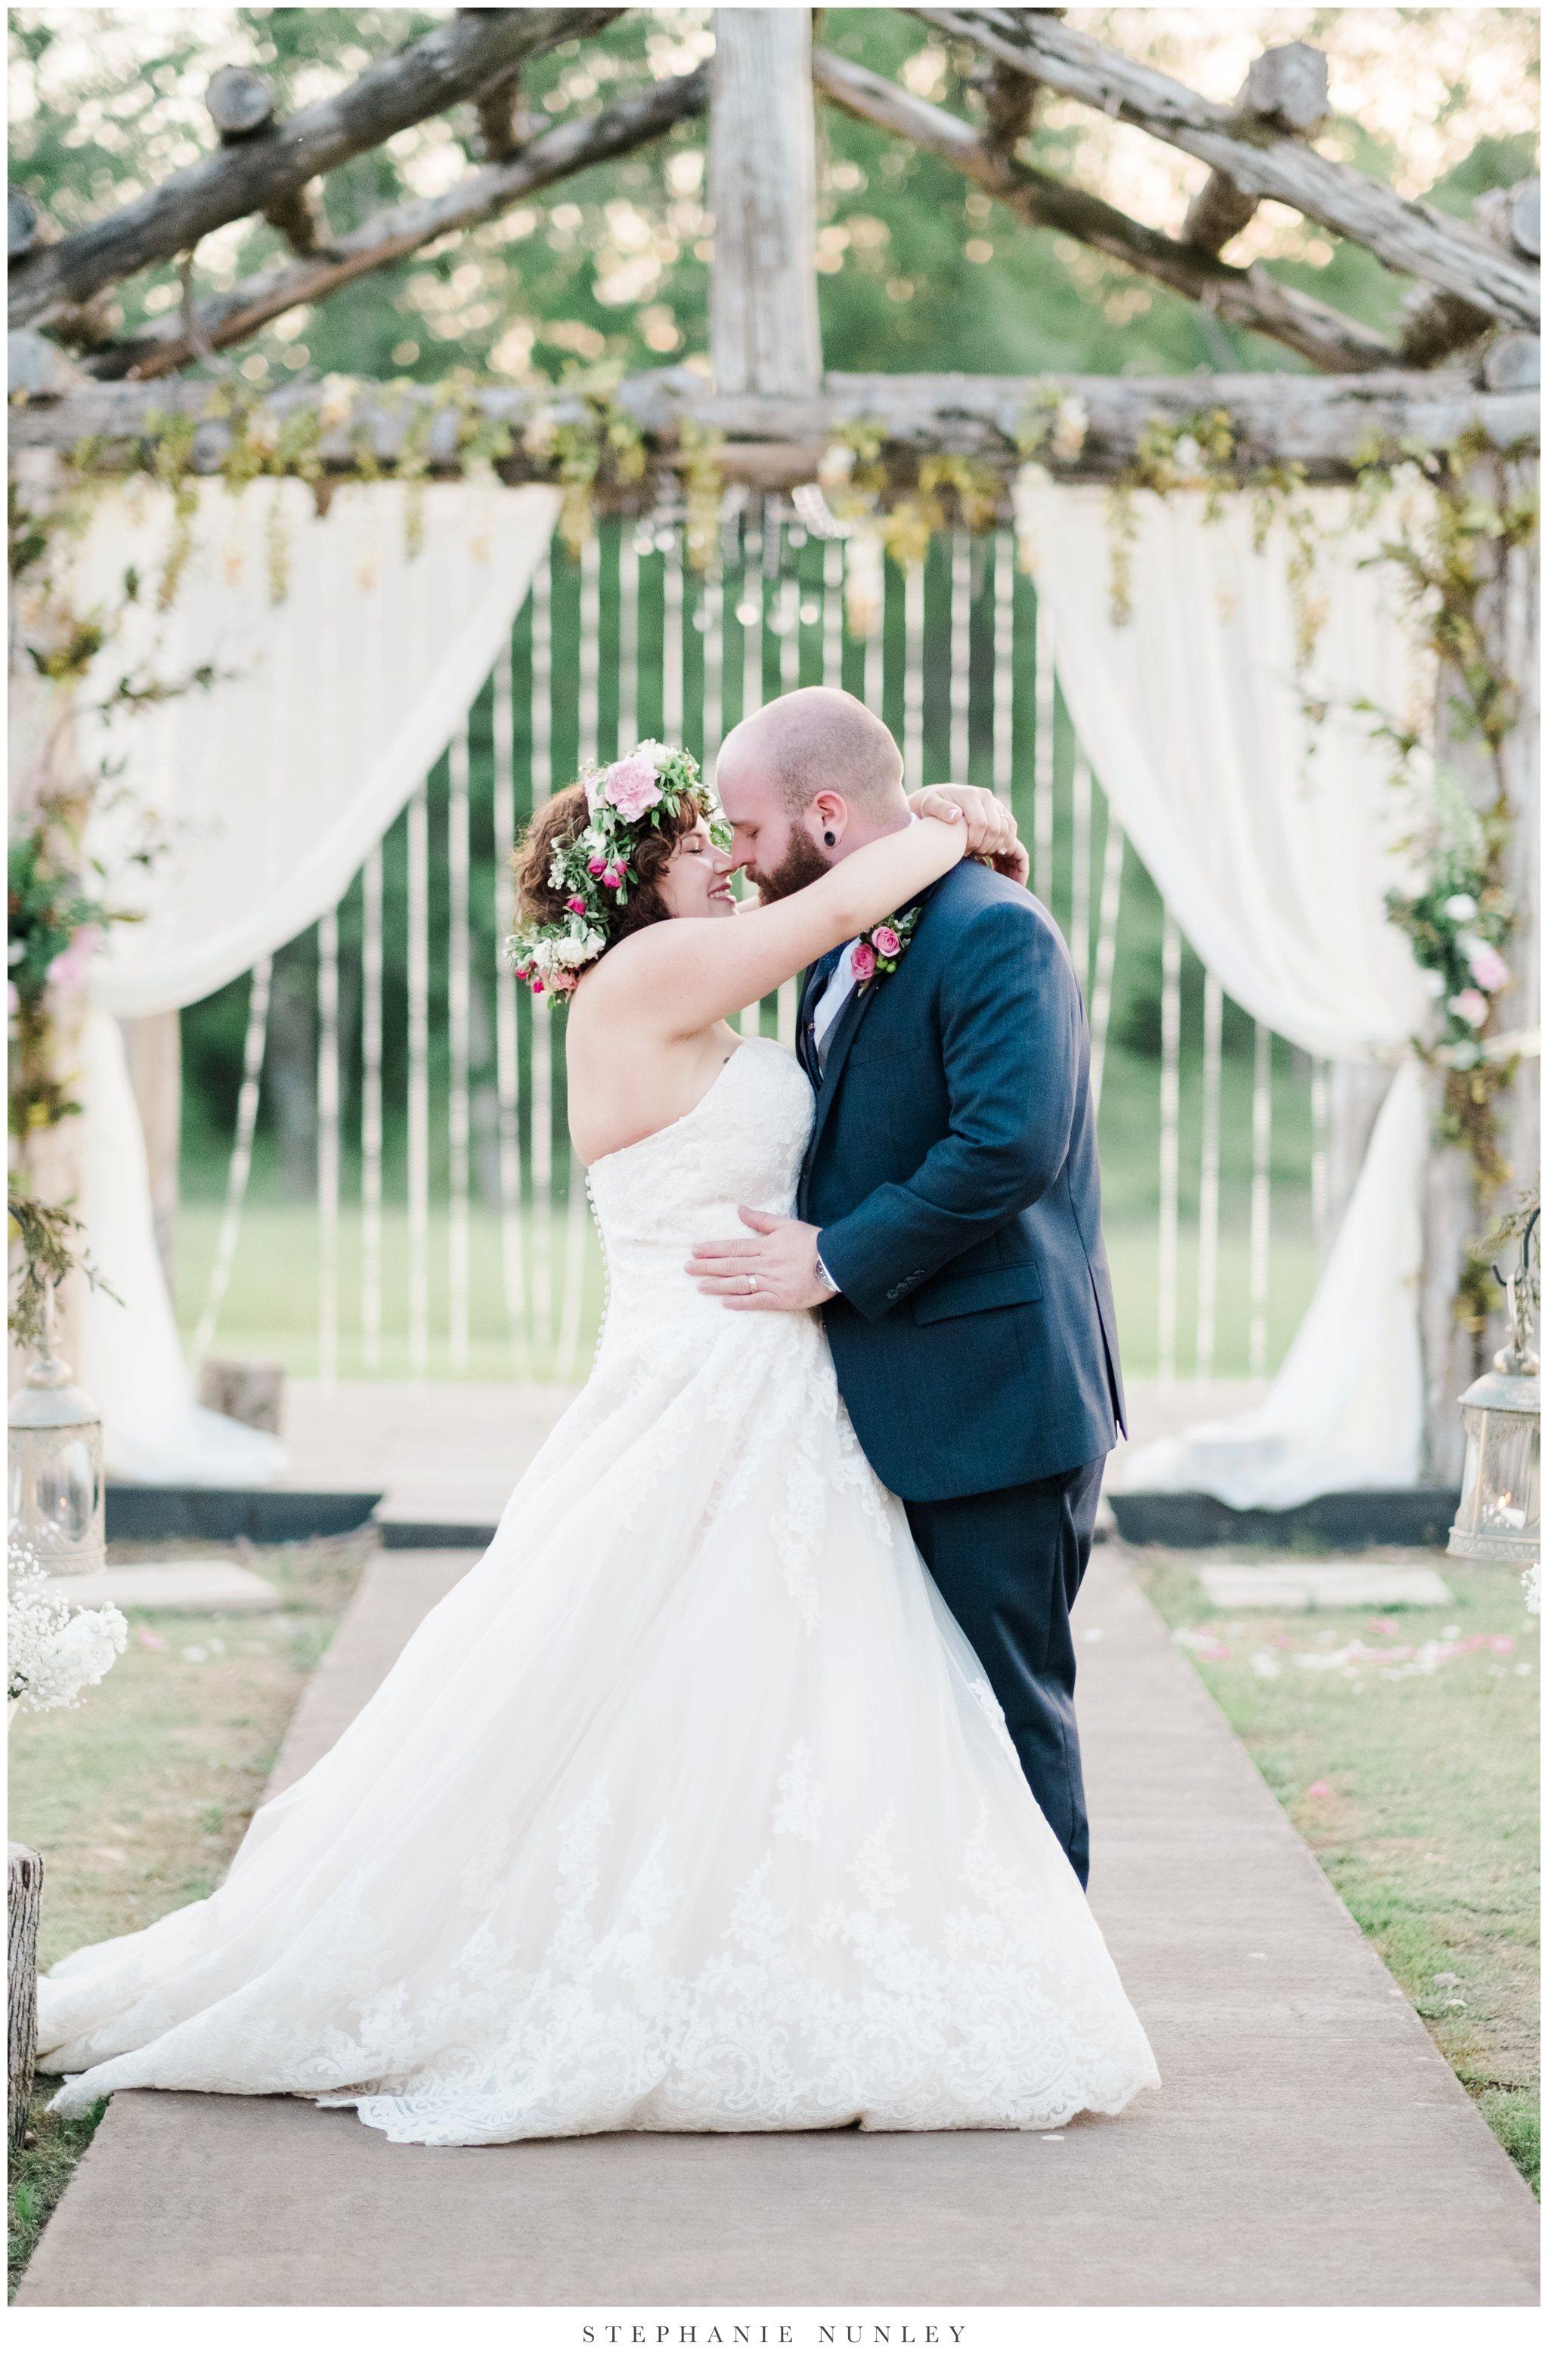 romantic-outdoor-wedding-with-flower-crown-0137.jpg